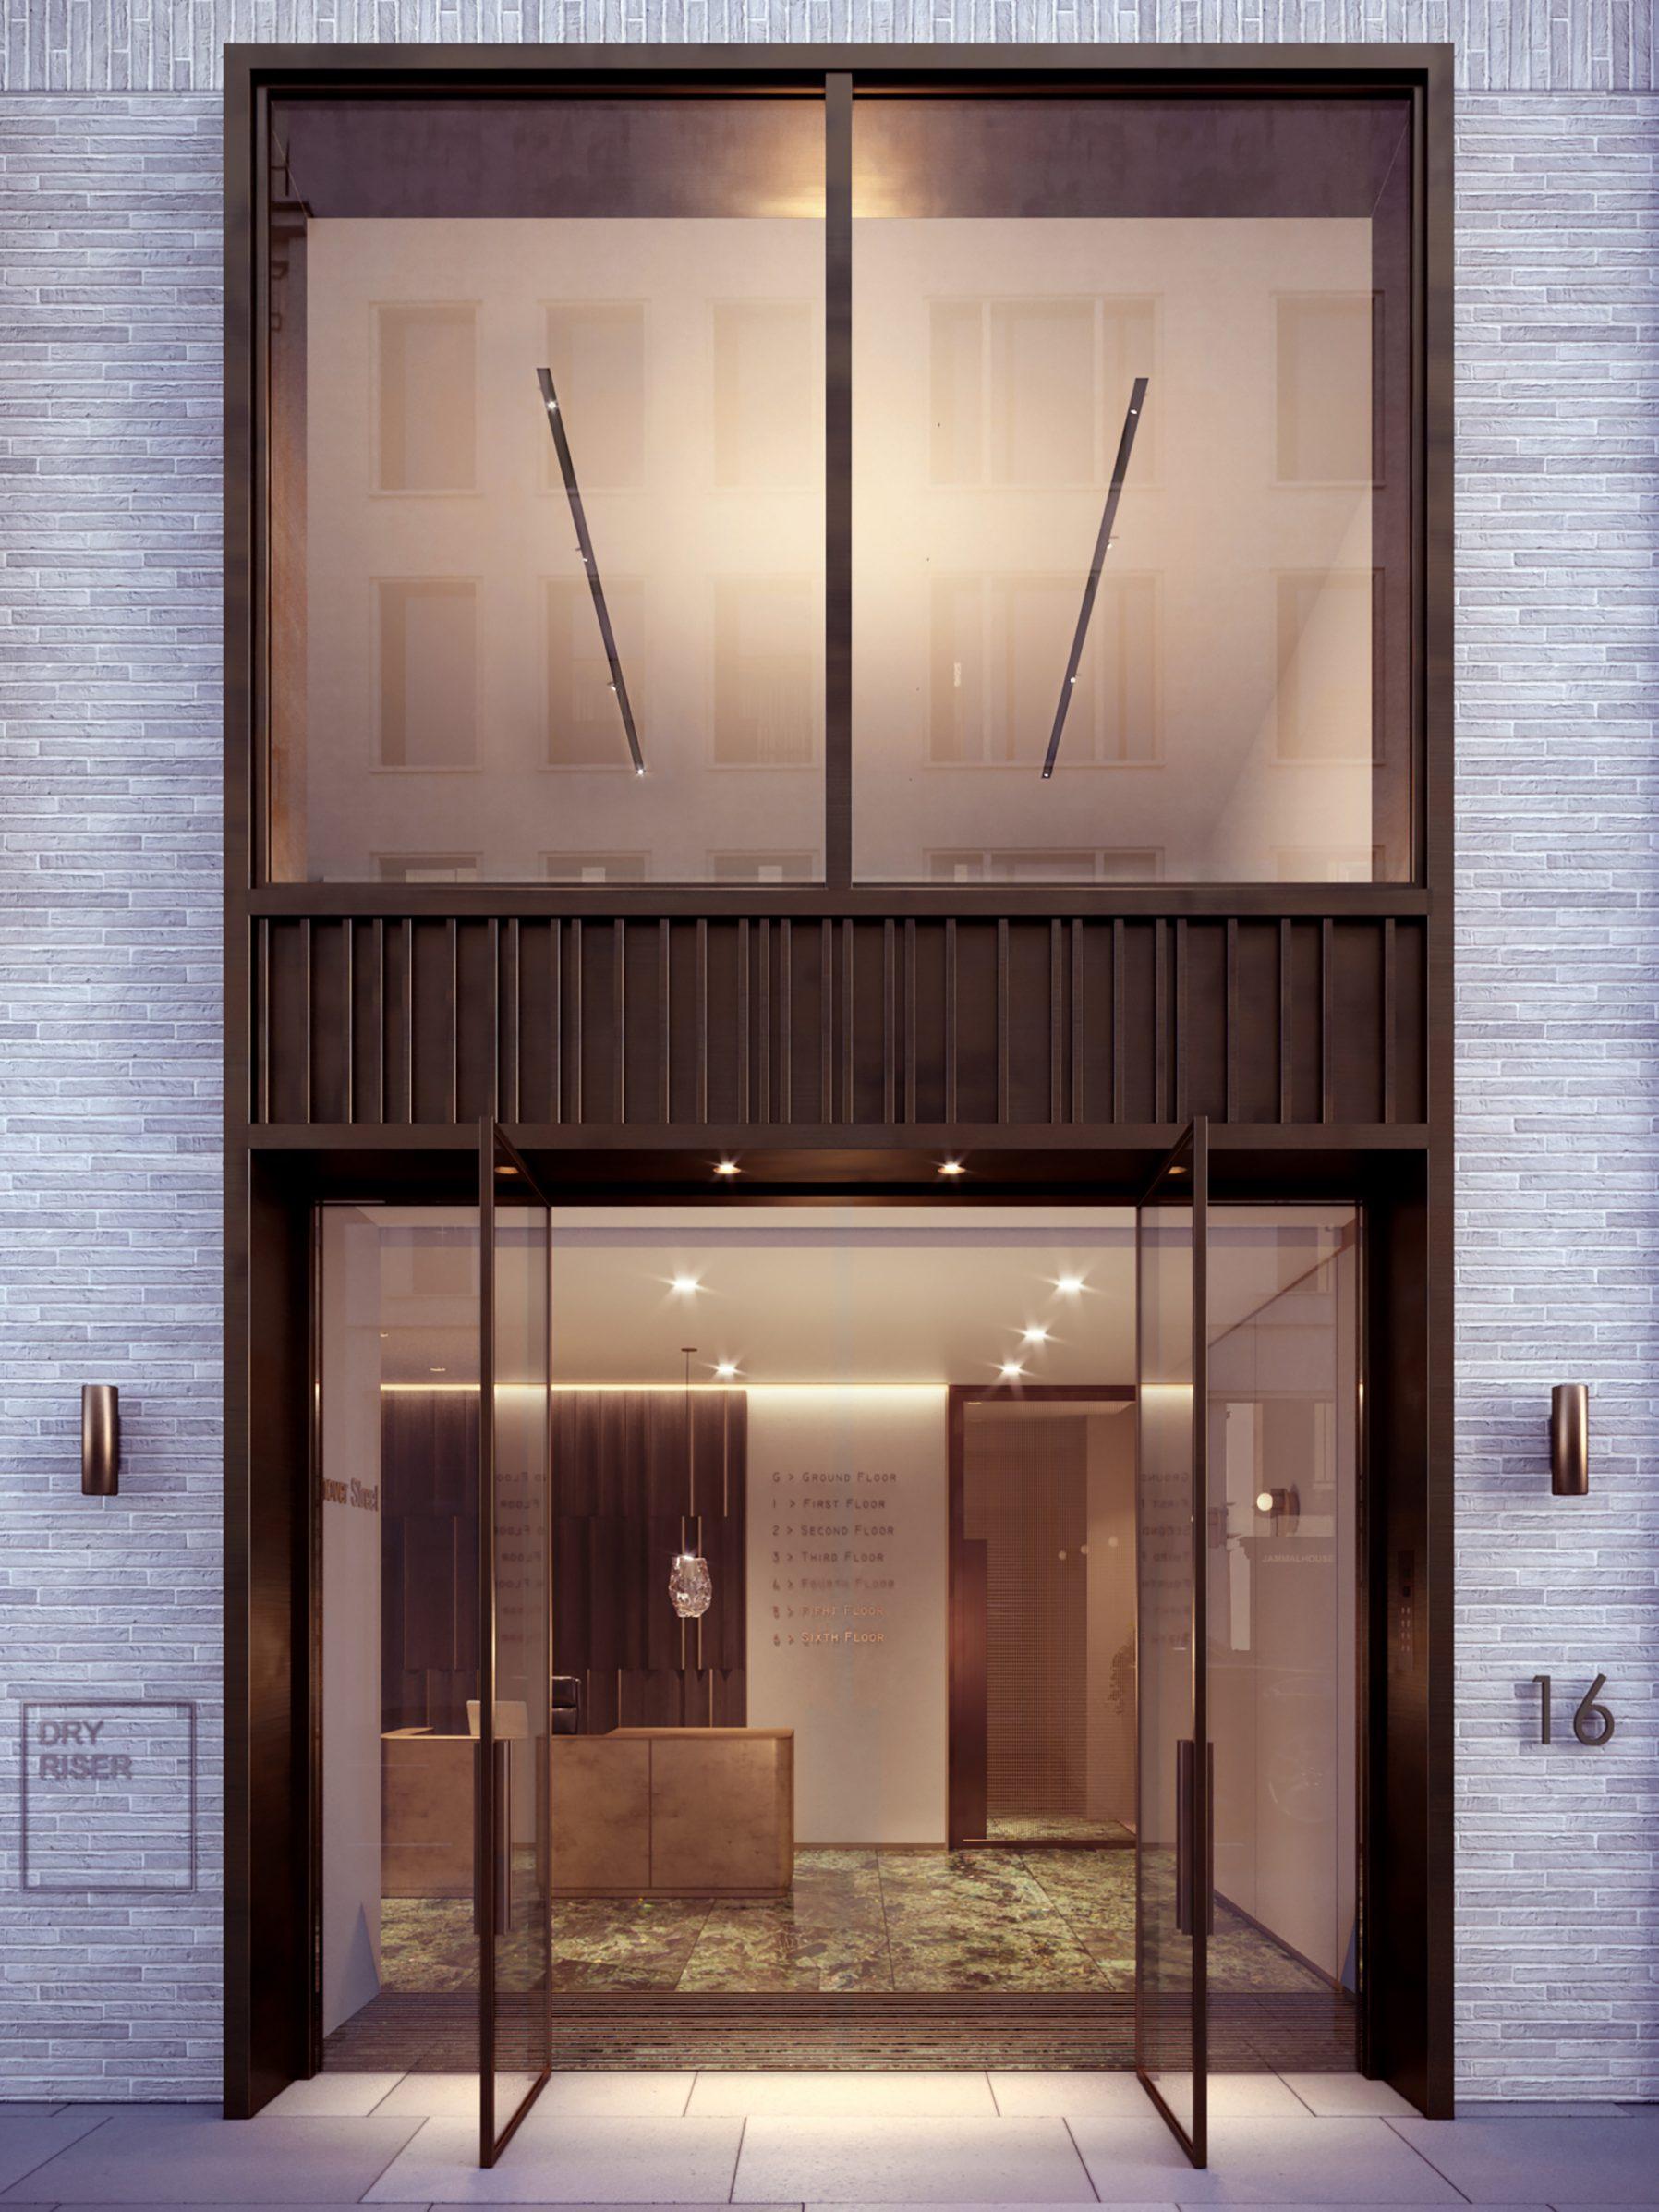 16 Hanover Street・London